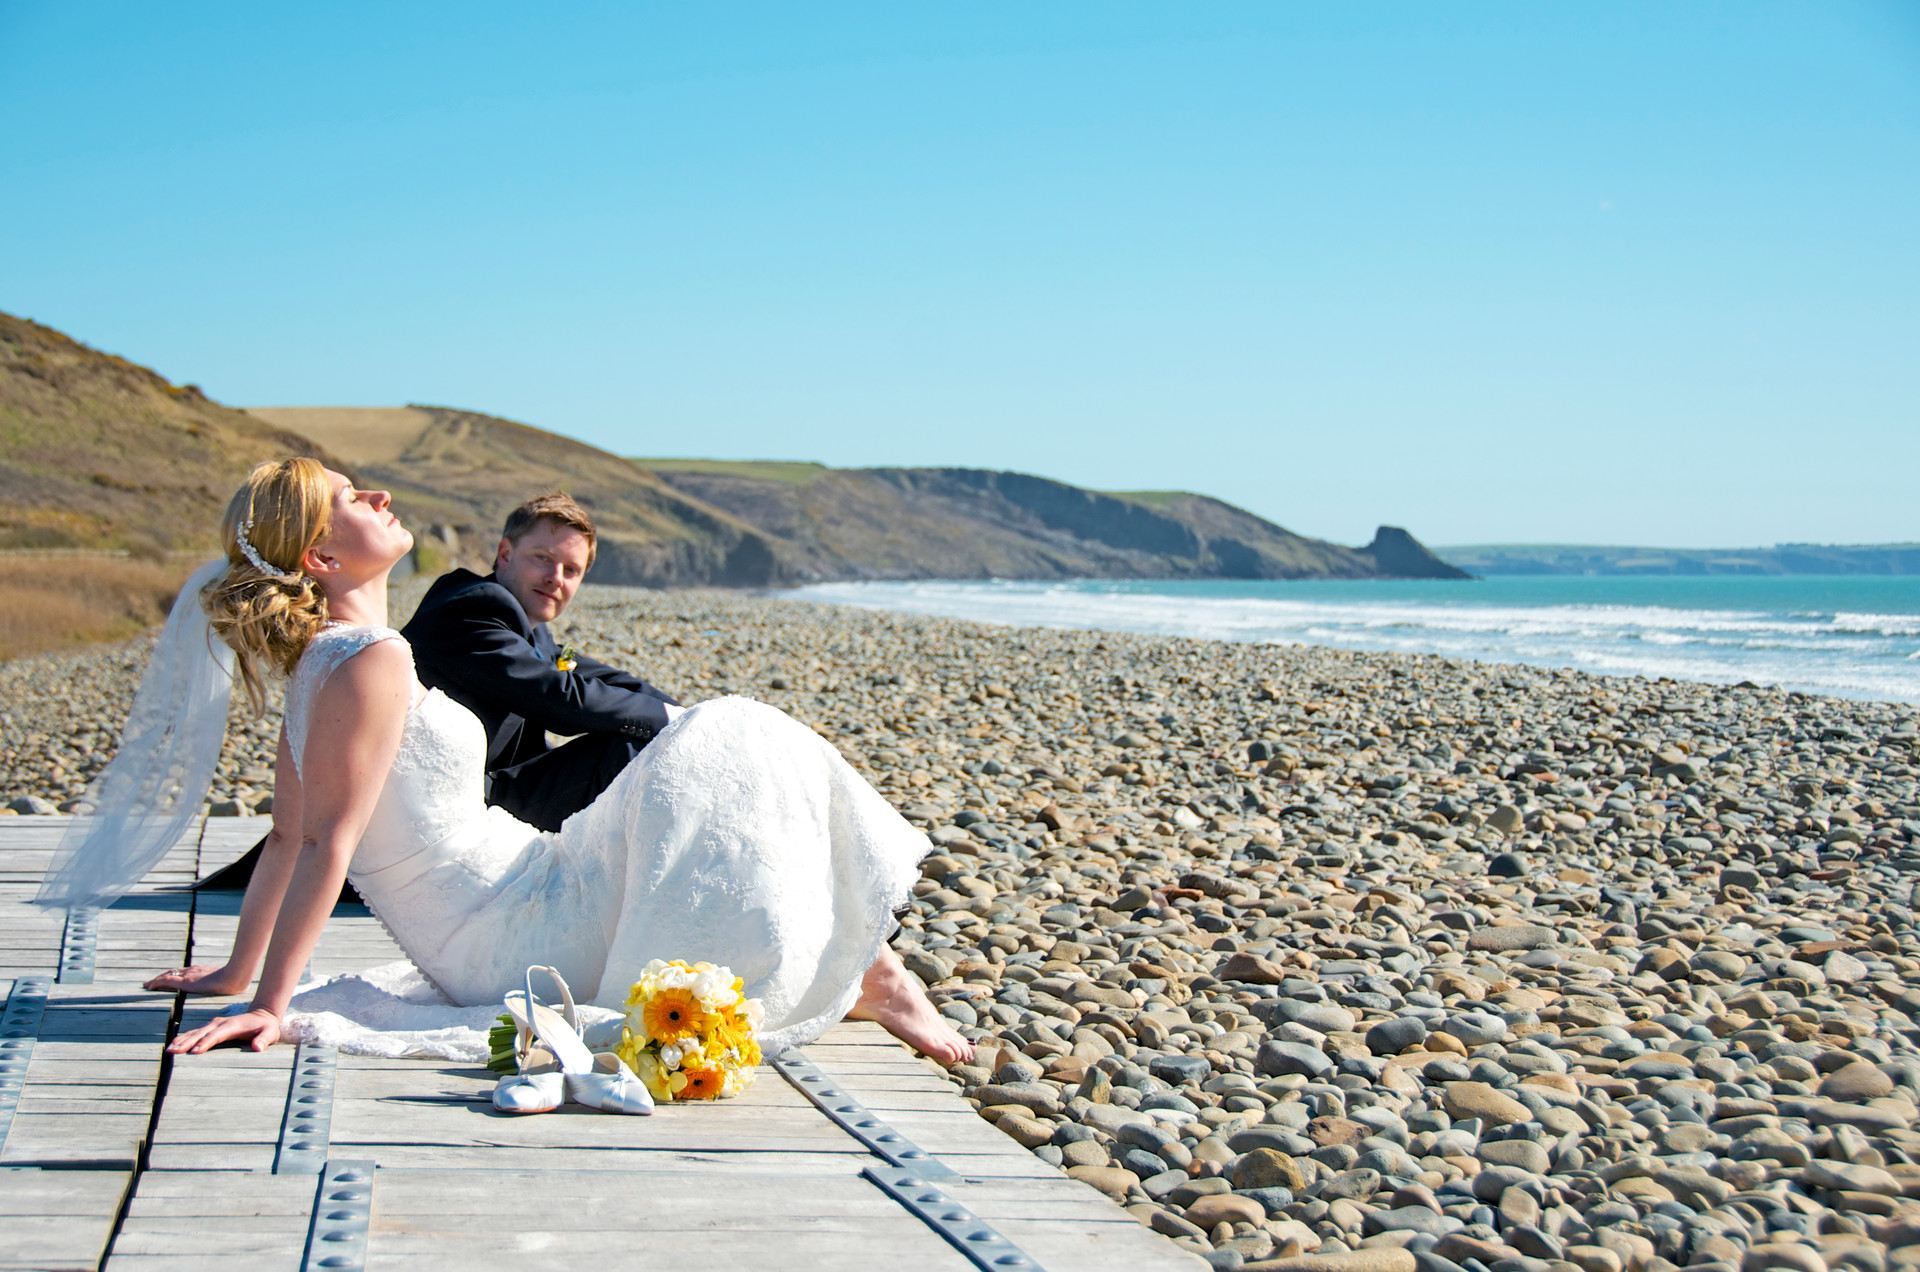 beach wedding west wales wedding photography